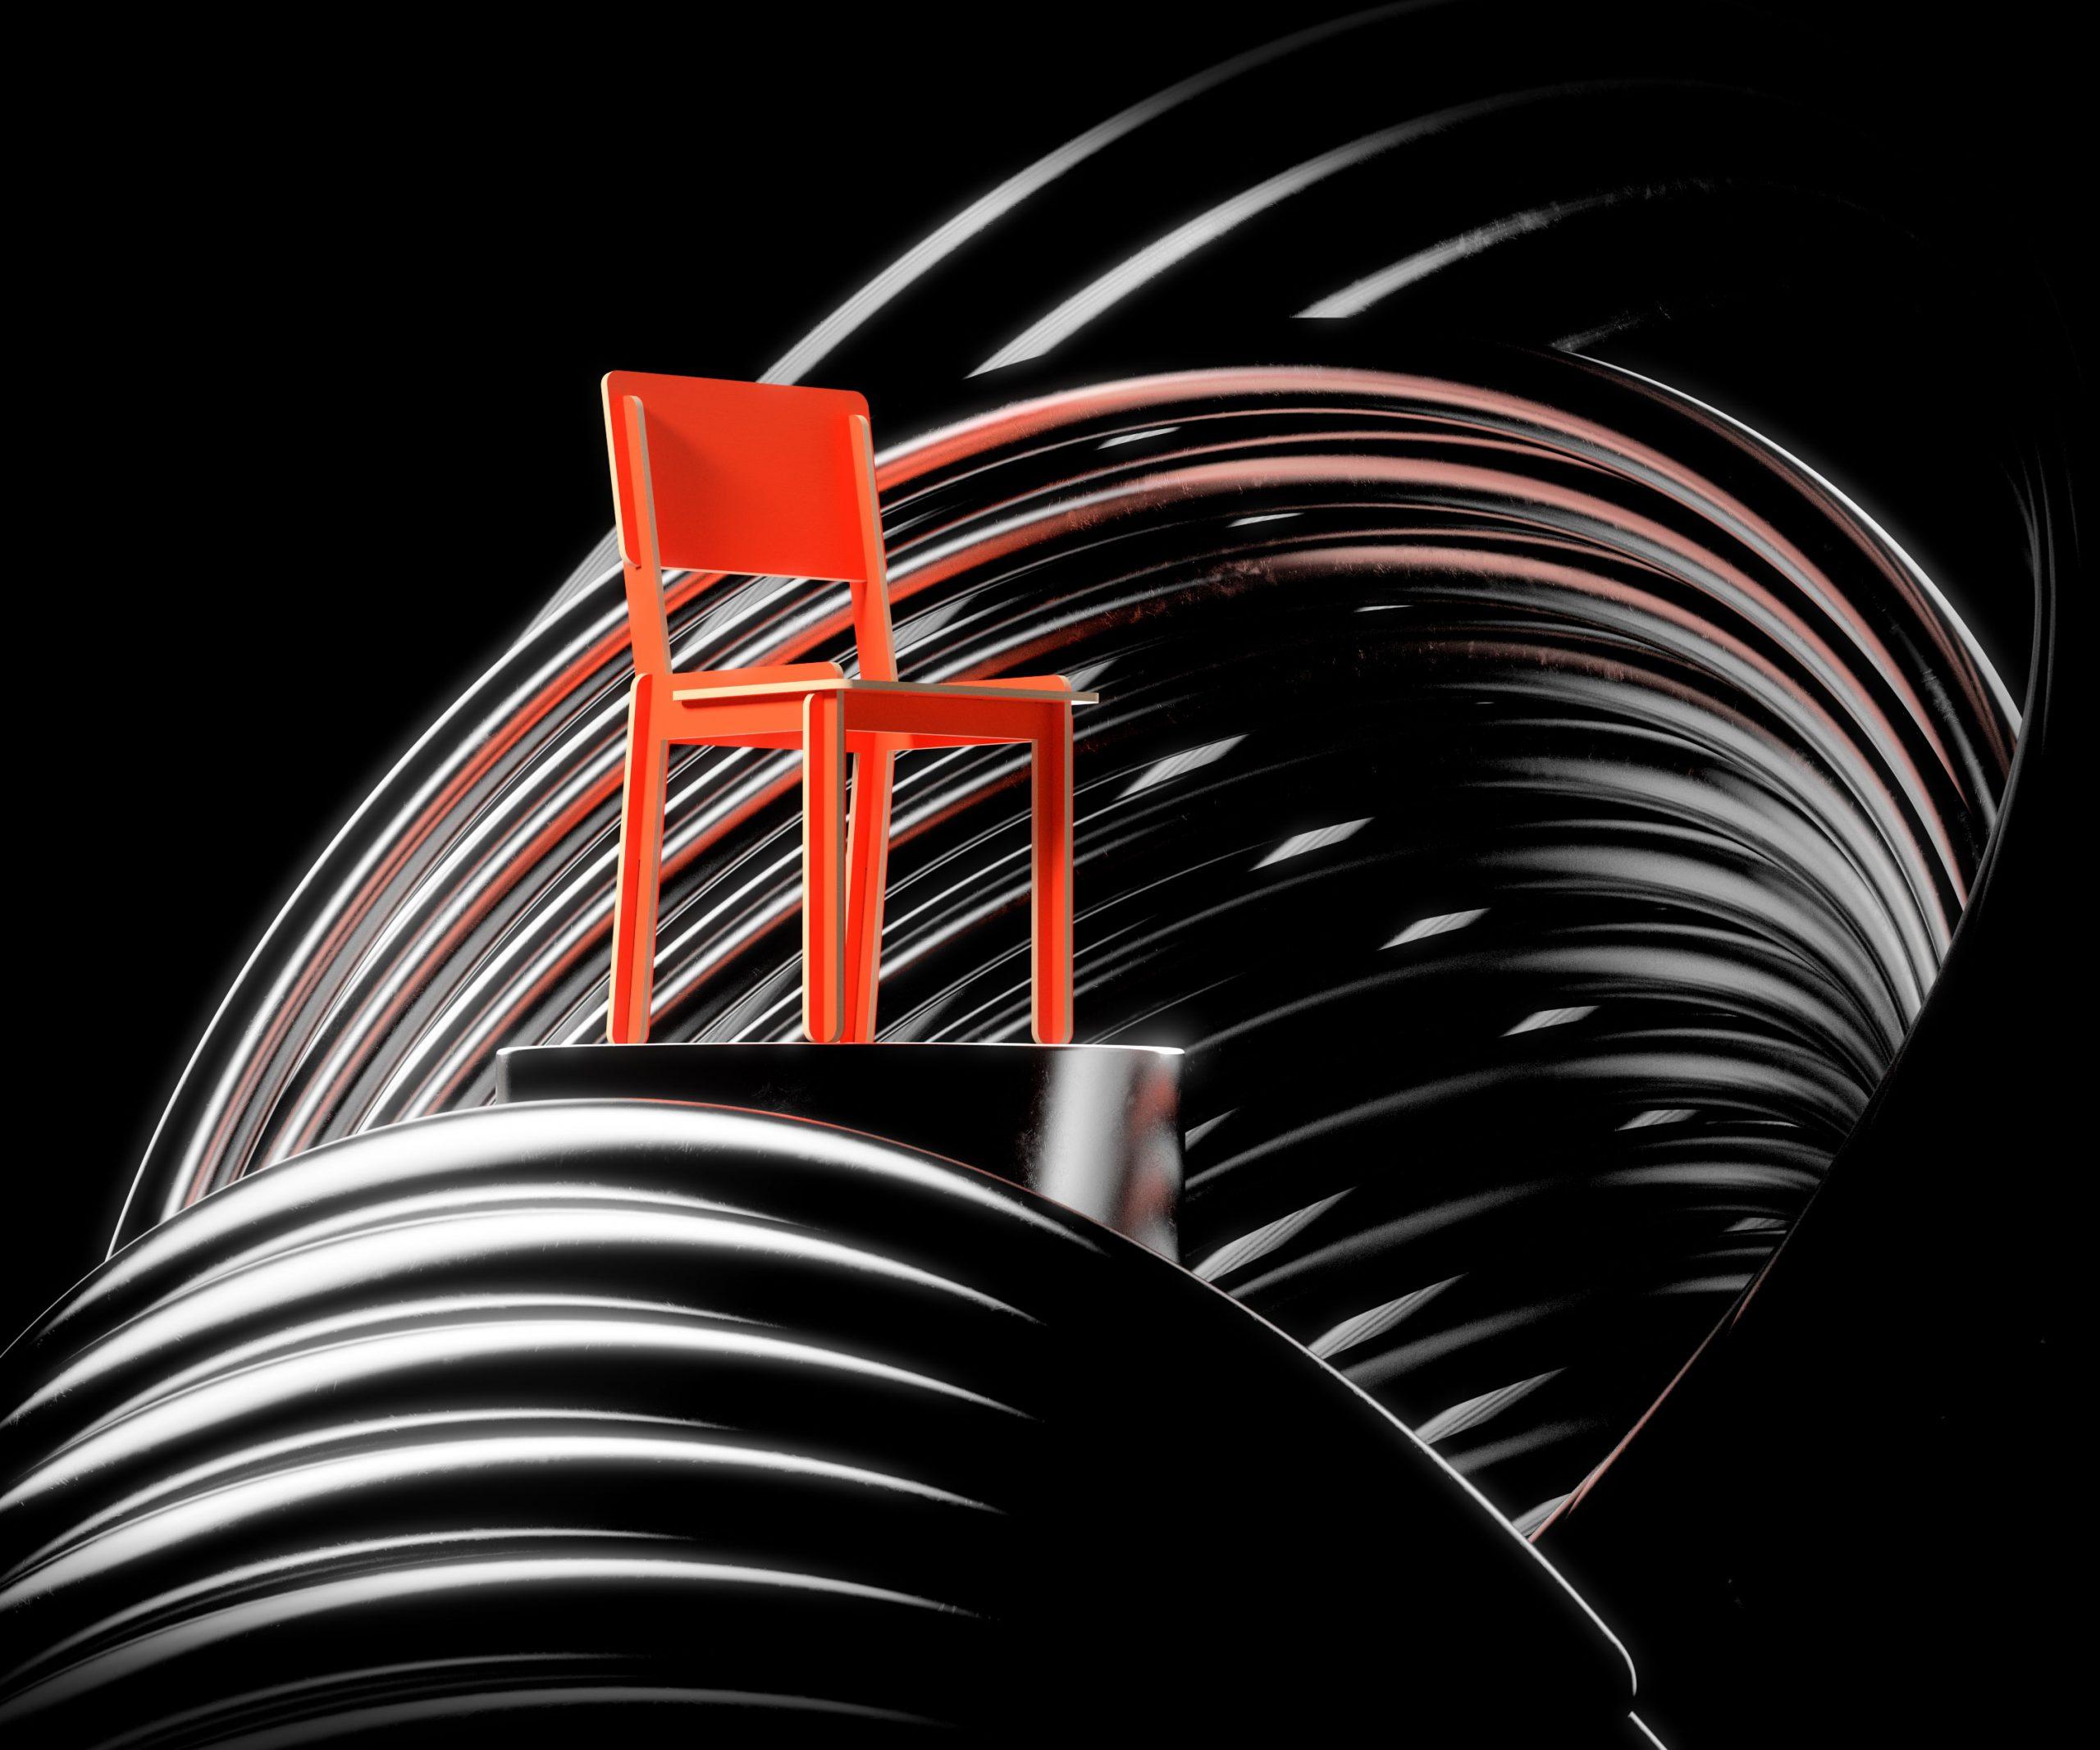 JOSBLOM_chair_final-1